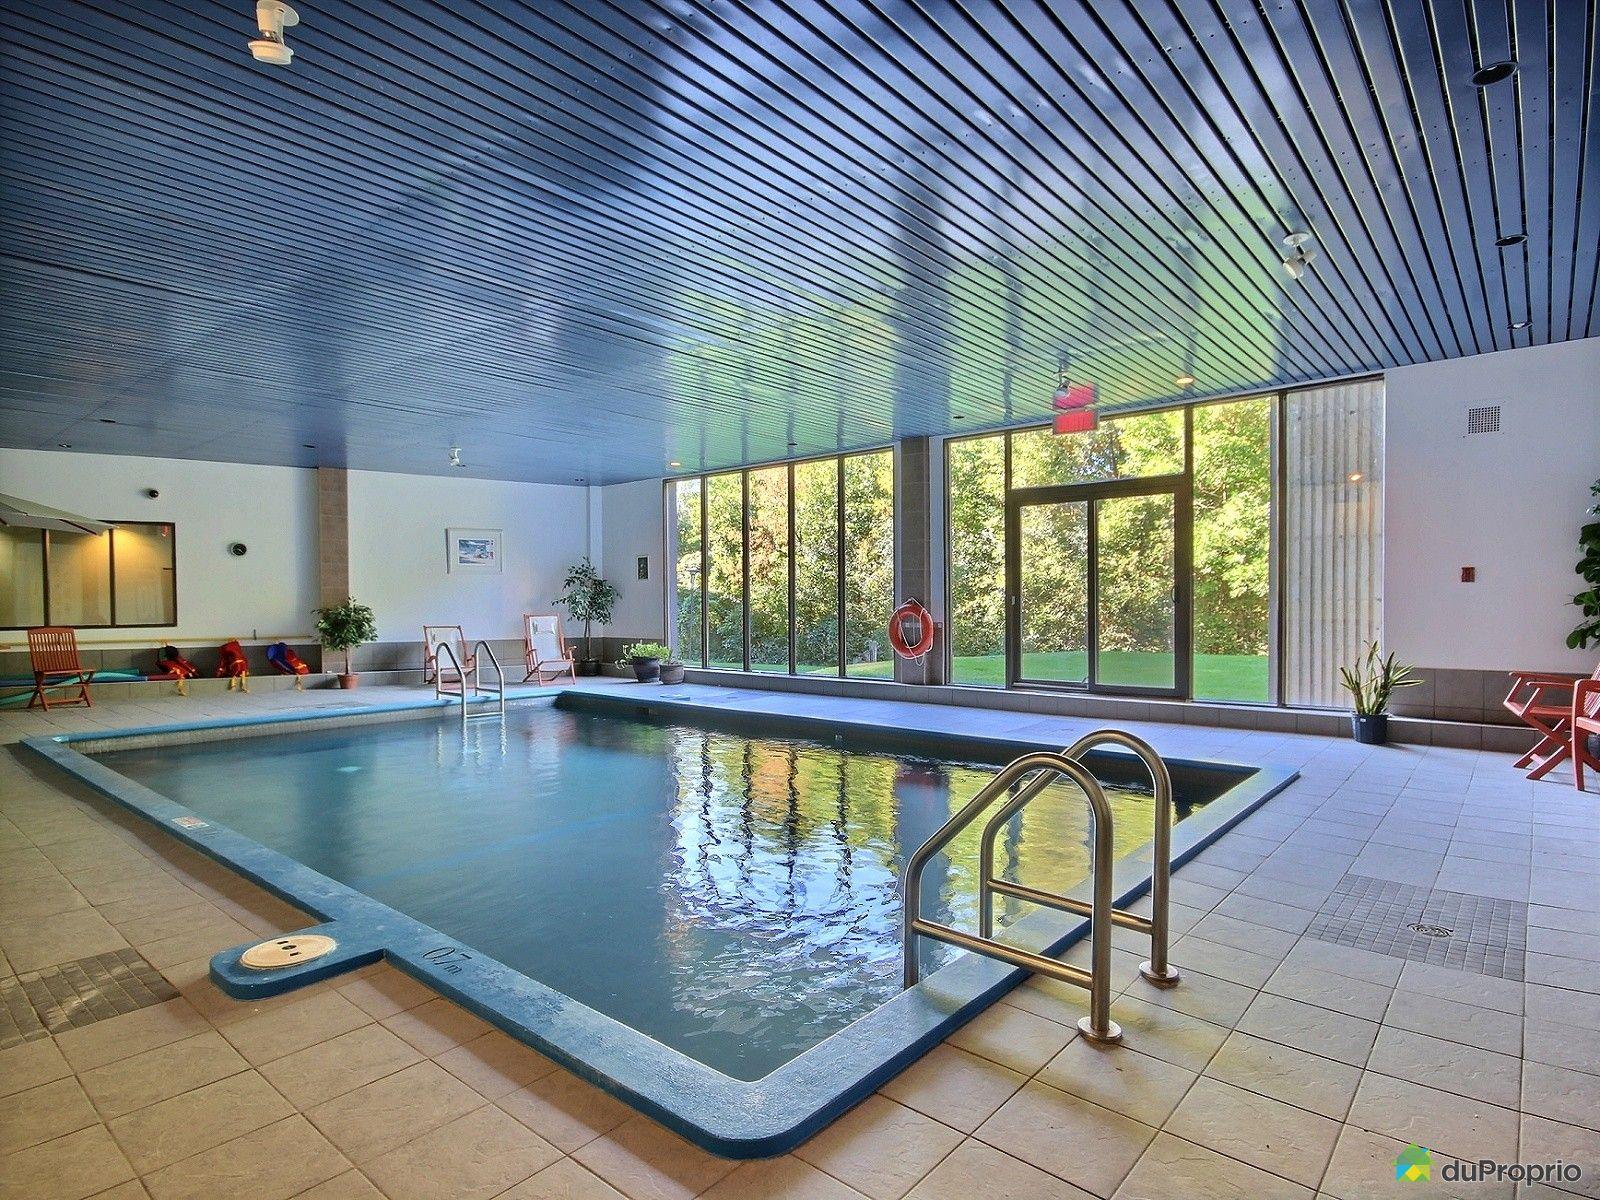 D coration piscine interieure saint lambert 71 argenteuil piscine interieure saint - Piscine bois rectangulaire argenteuil ...